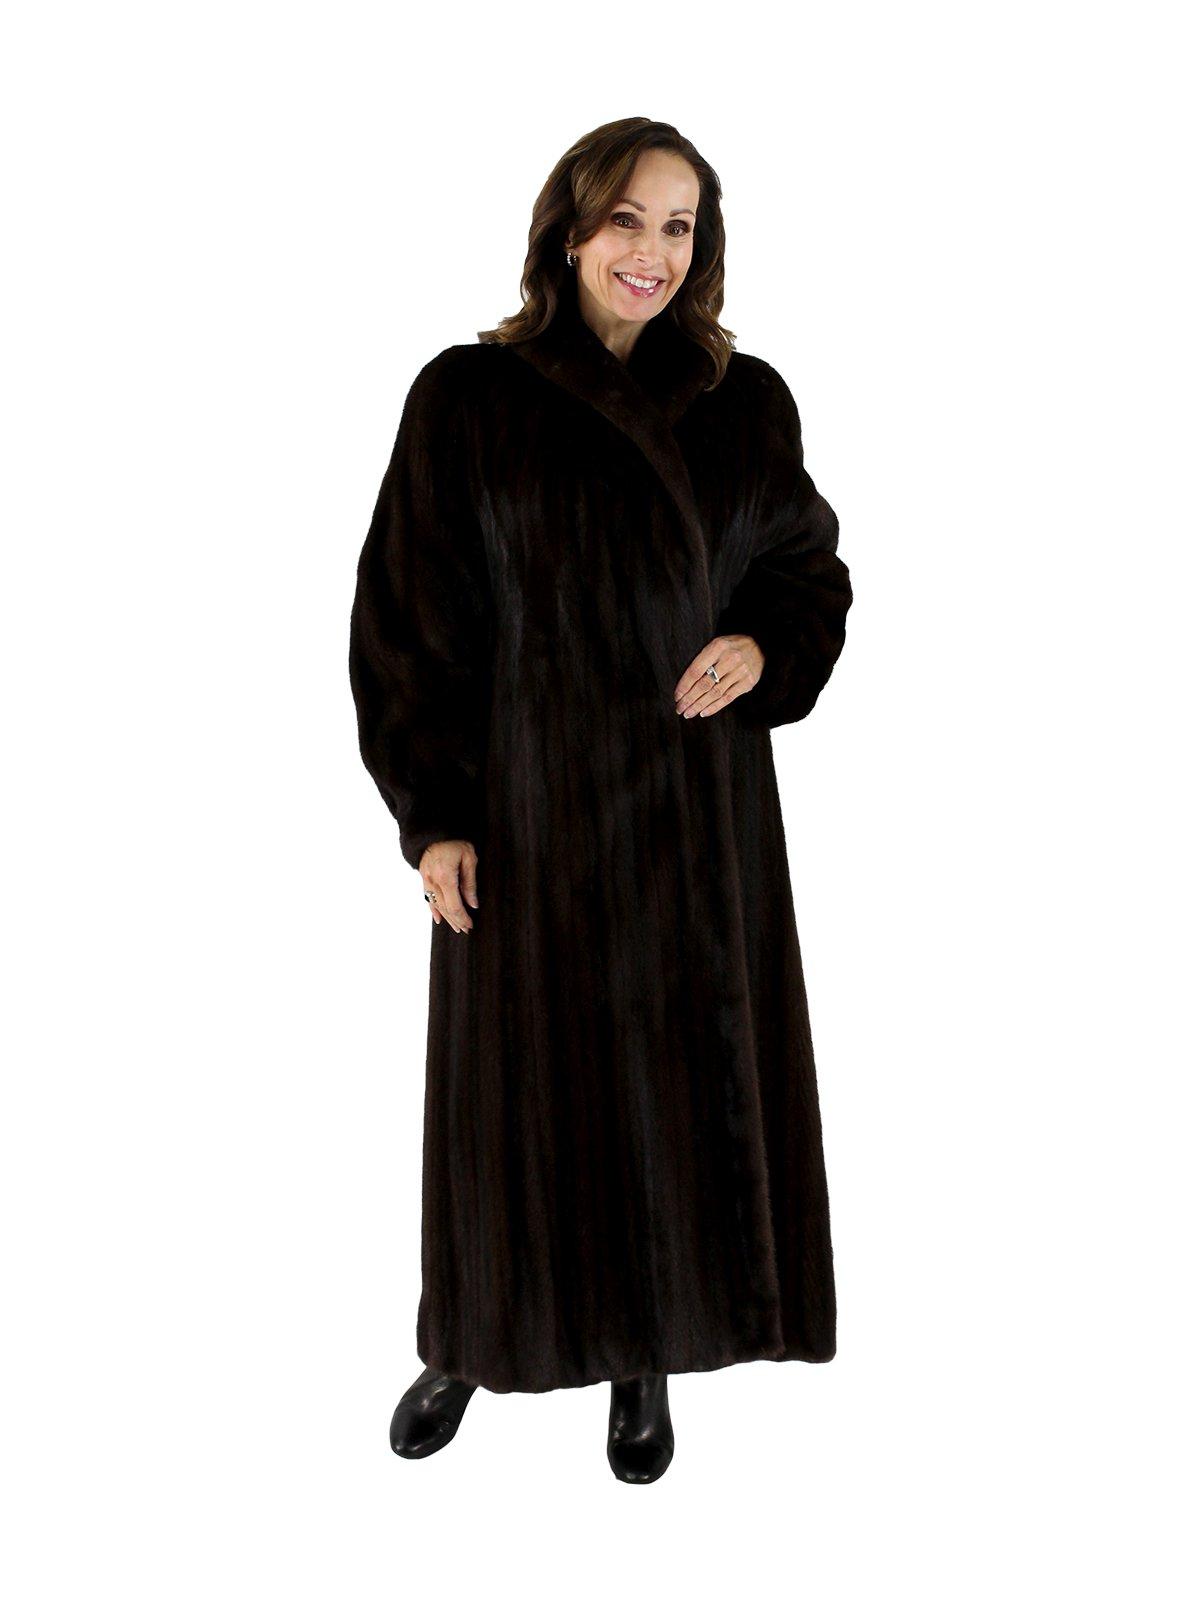 b3852fead Mink Fur Coat - Women's Large (14) - Dark Mahogany | Estate Furs